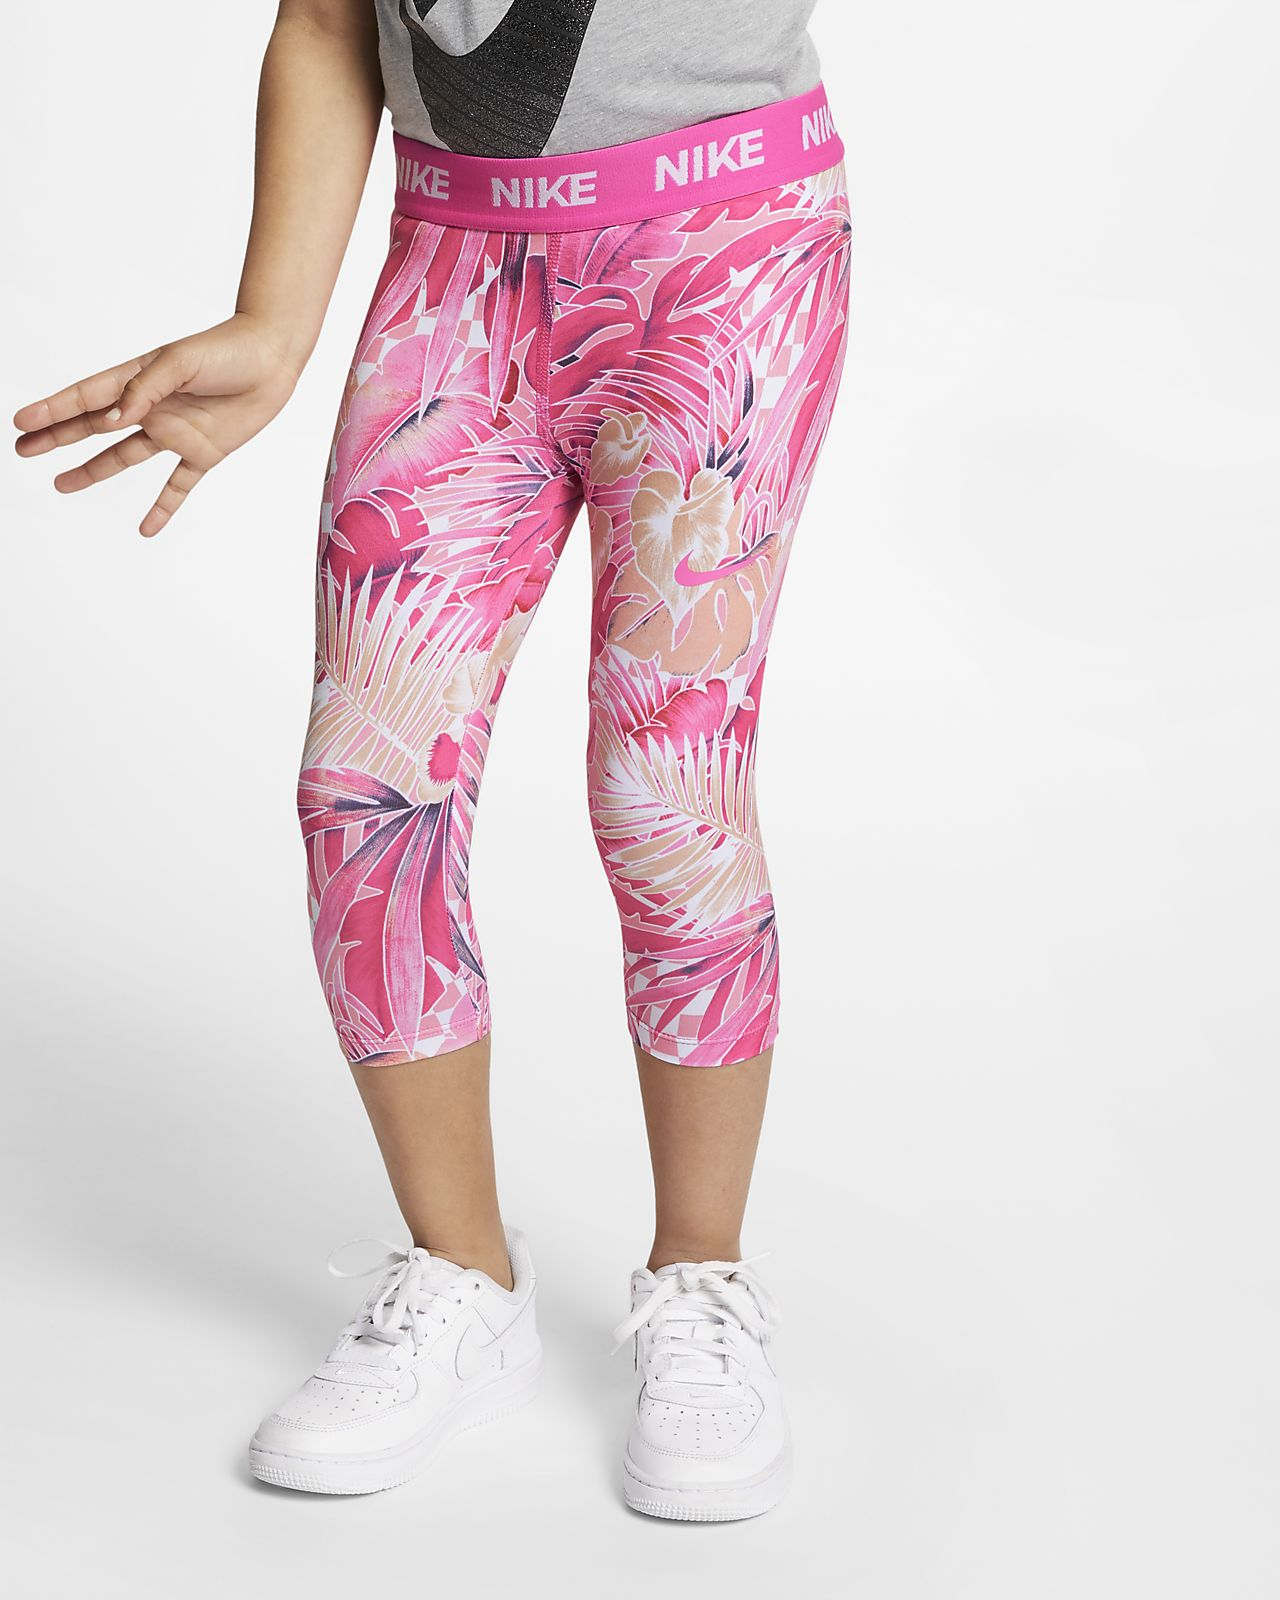 Nike 3/4-Leggings mit Print für jüngere Kinder